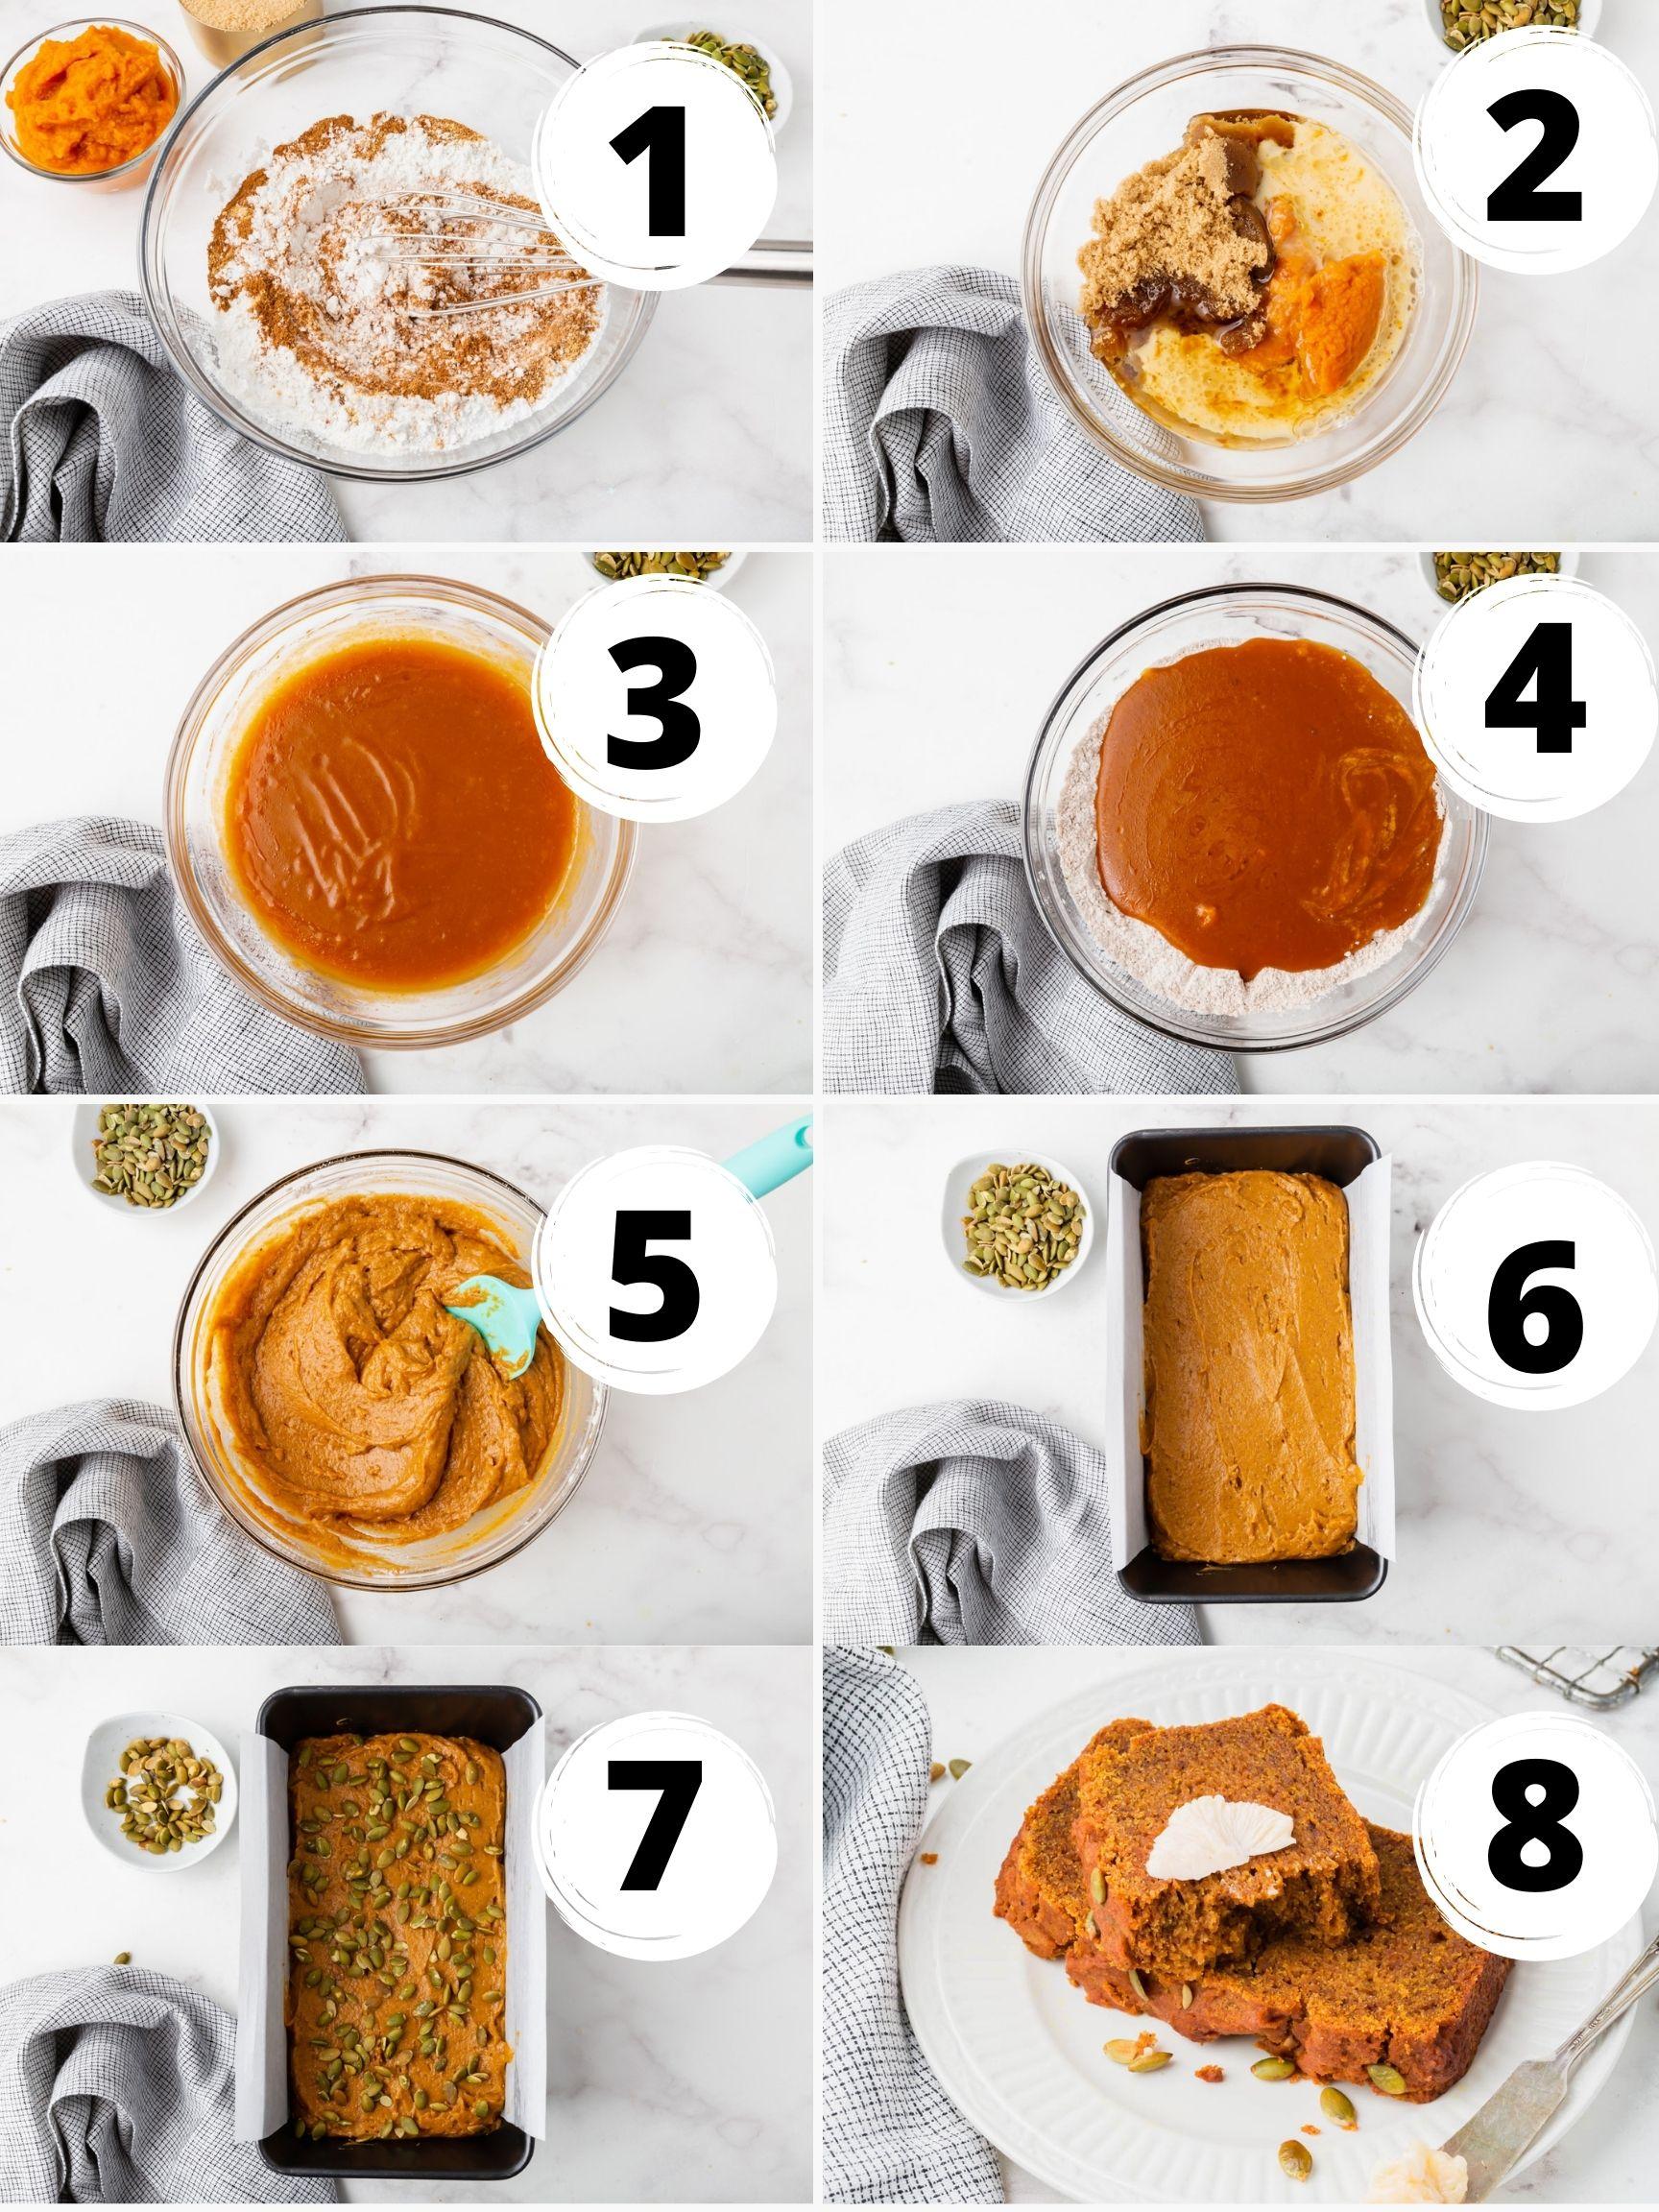 Collage of 8 steps to make vegan pumpkin bread